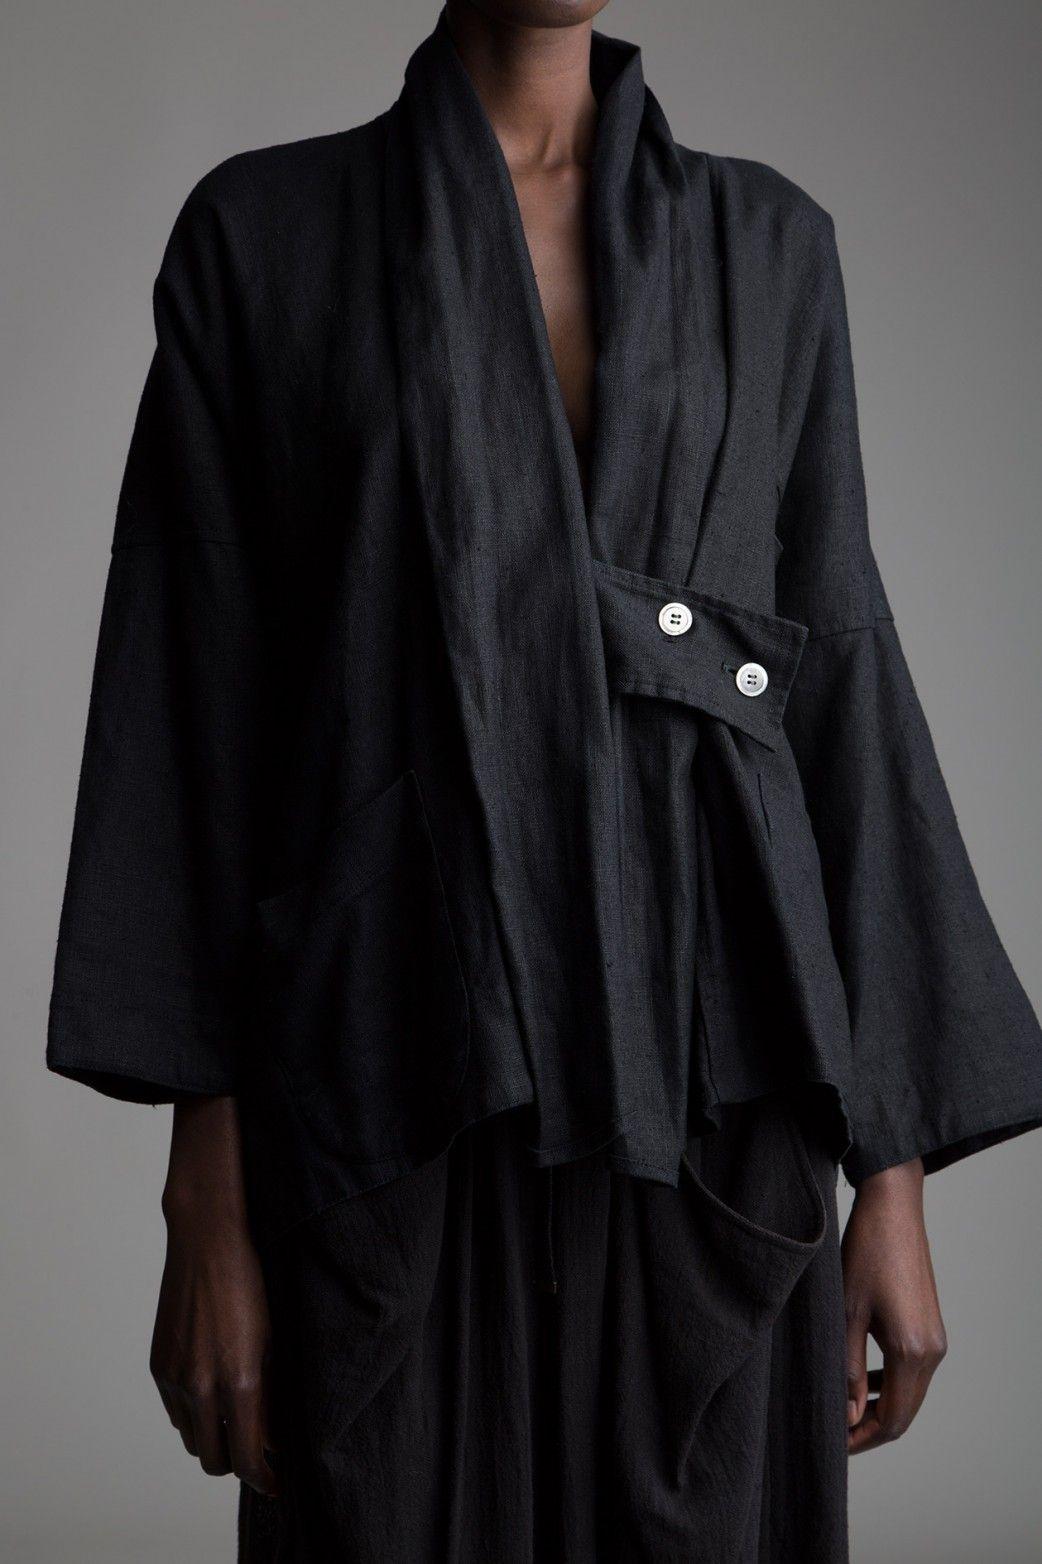 9d163dc098306c Vintage Y's Yohji Yamamoto Linen Jacket Designer Vintage Clothing Minimal  Fashion